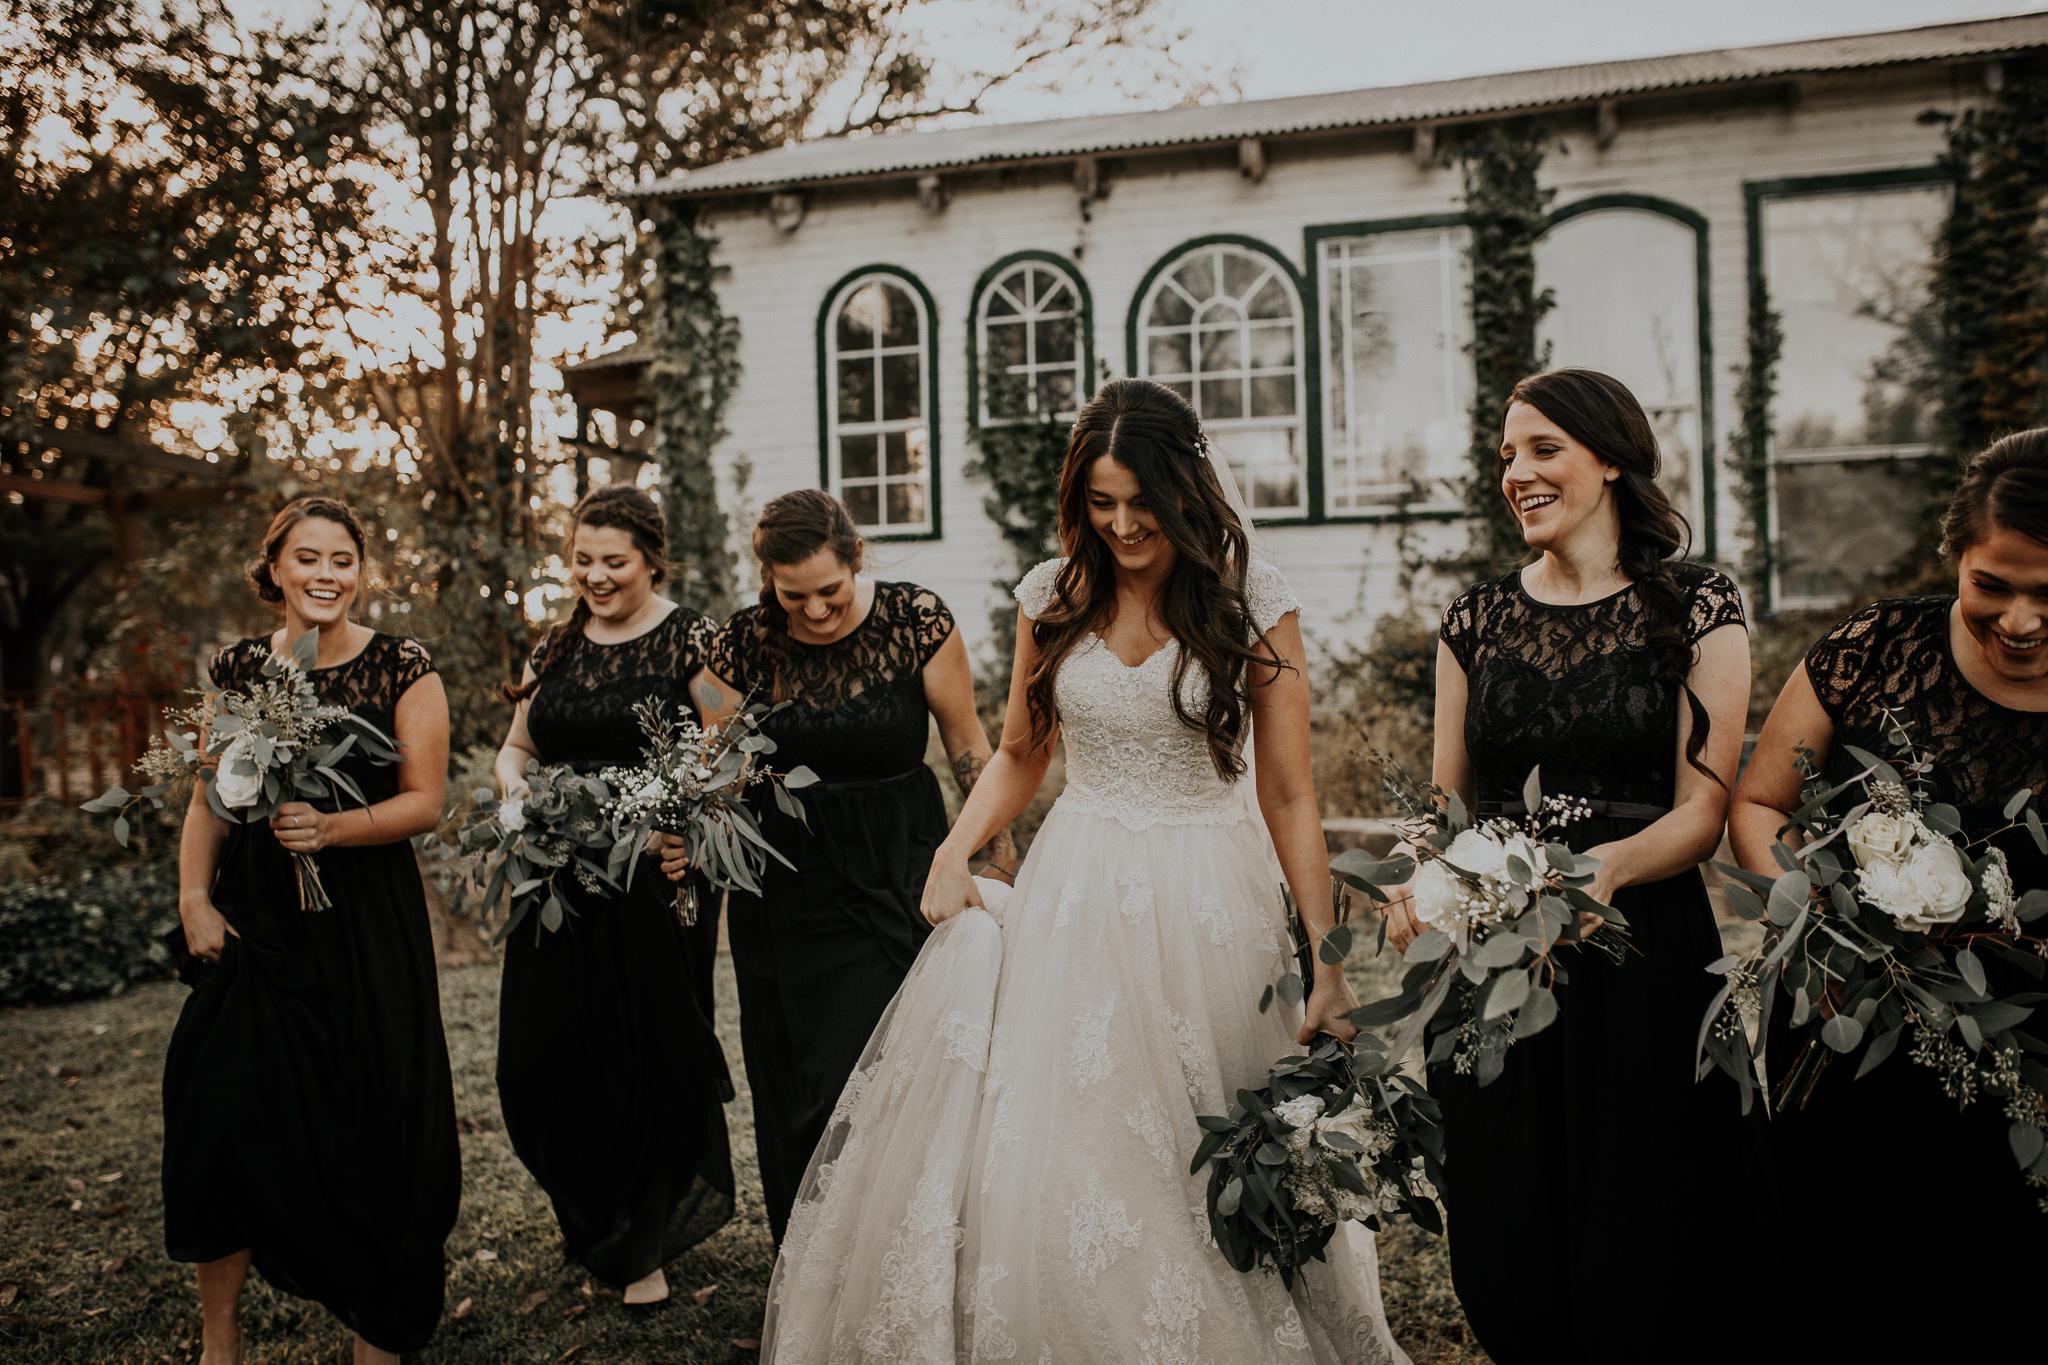 Fort-Worth-Photographer-Wedding-Photographer-Laken-Mackenzie-Photography (1 of 1)-5.jpg